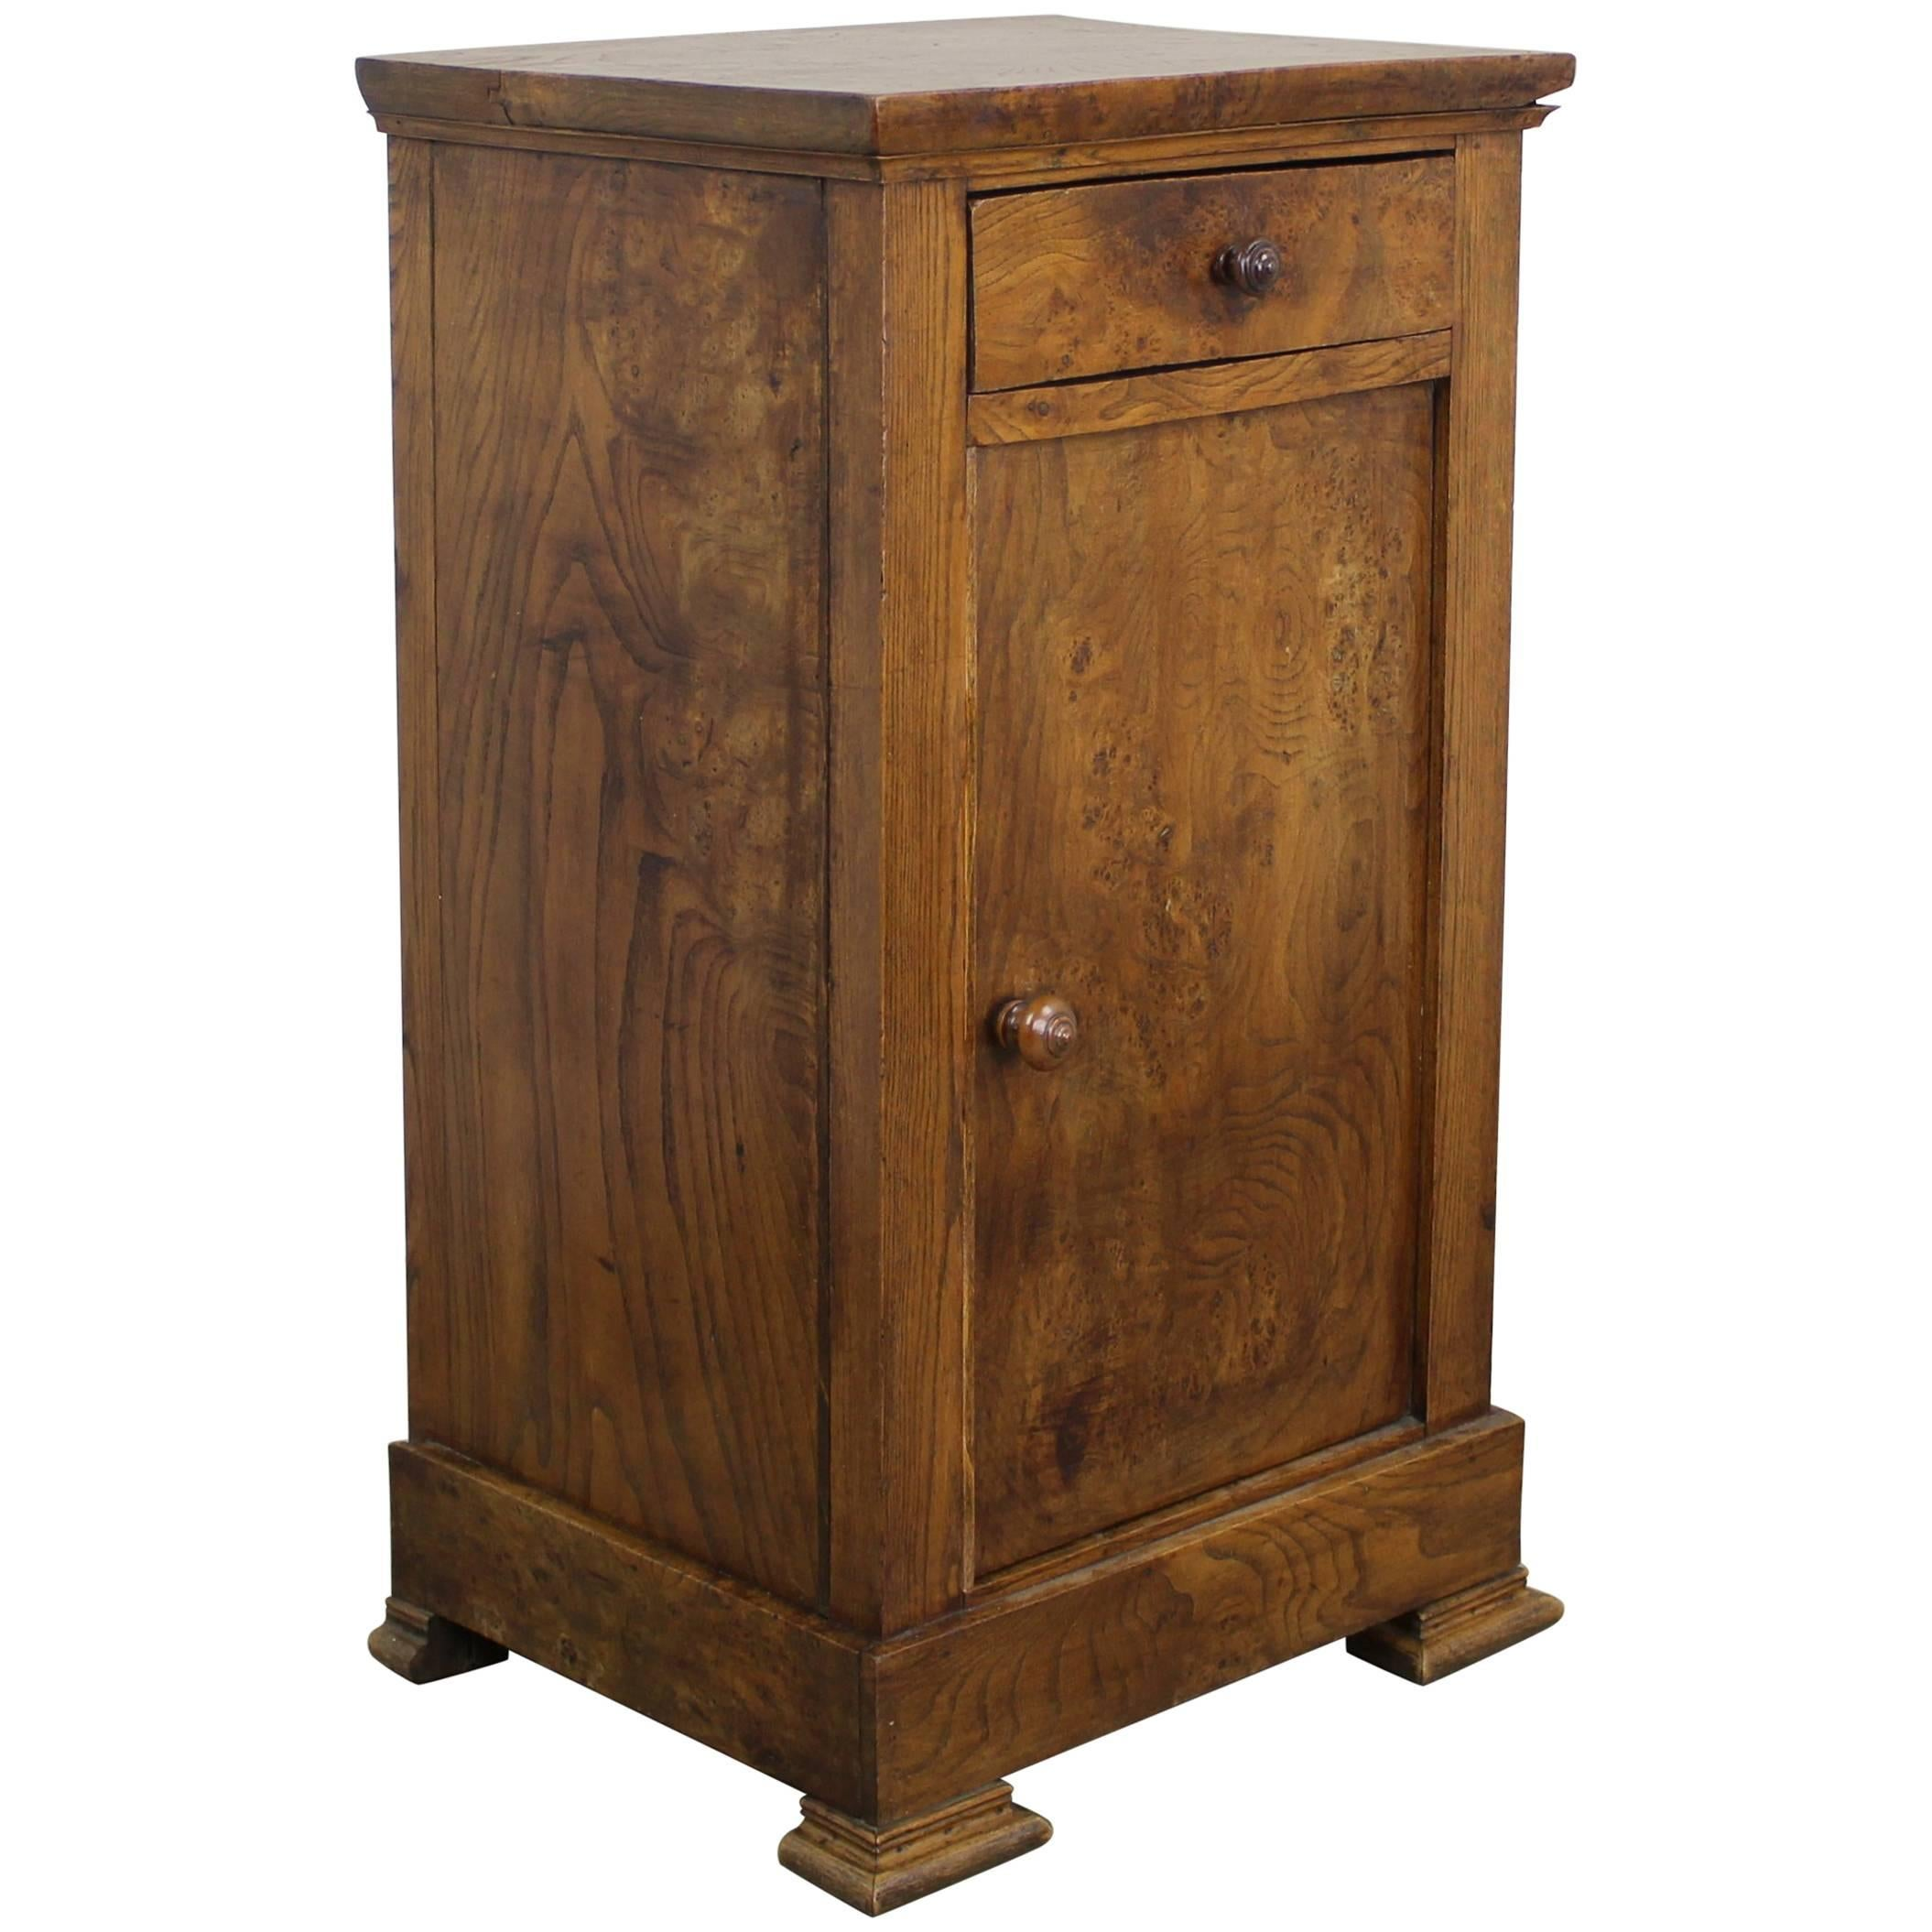 Antique French Burr Elm Side Cabinet